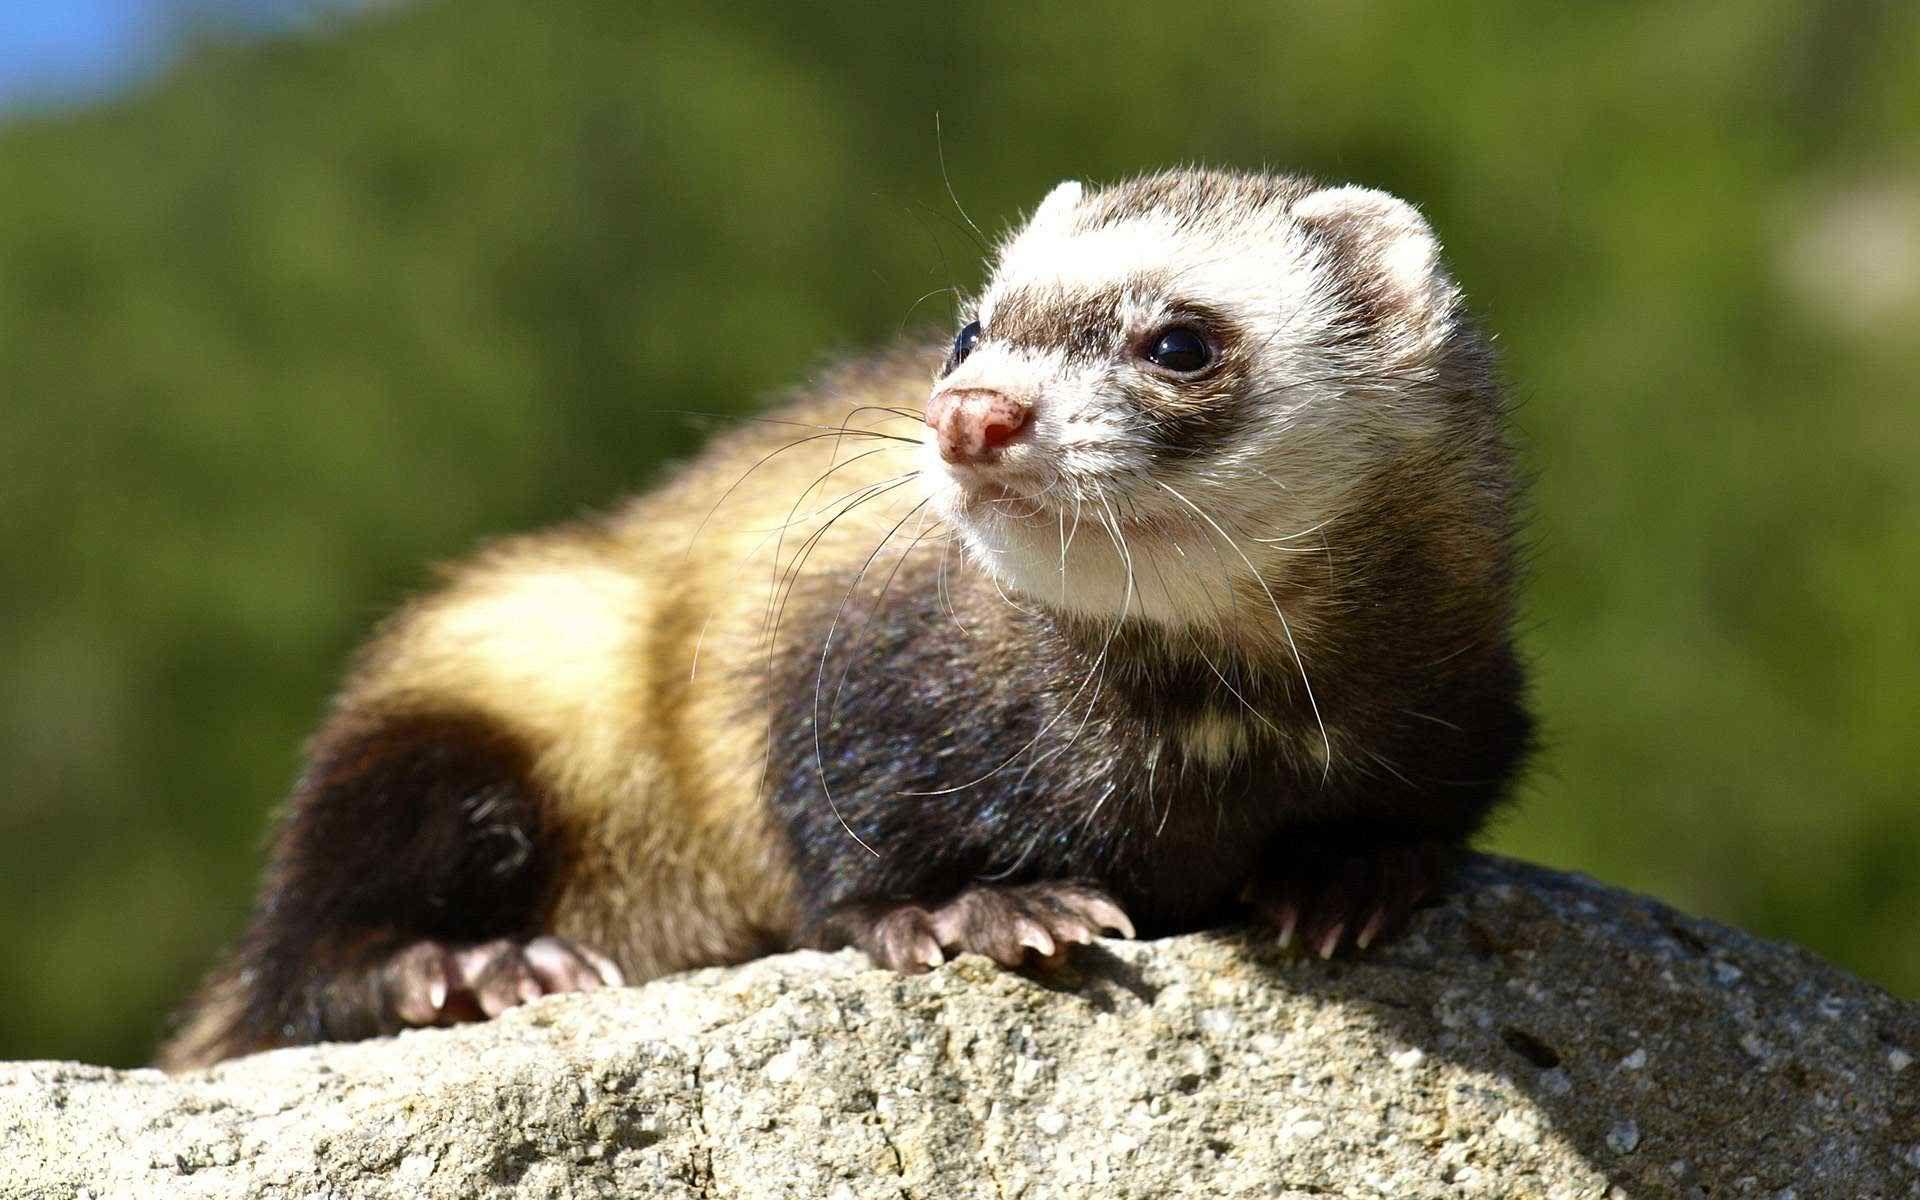 Ferret Desktop Wallpapers Ferret Pictures Cute Ferrets Endangered Animals Animals